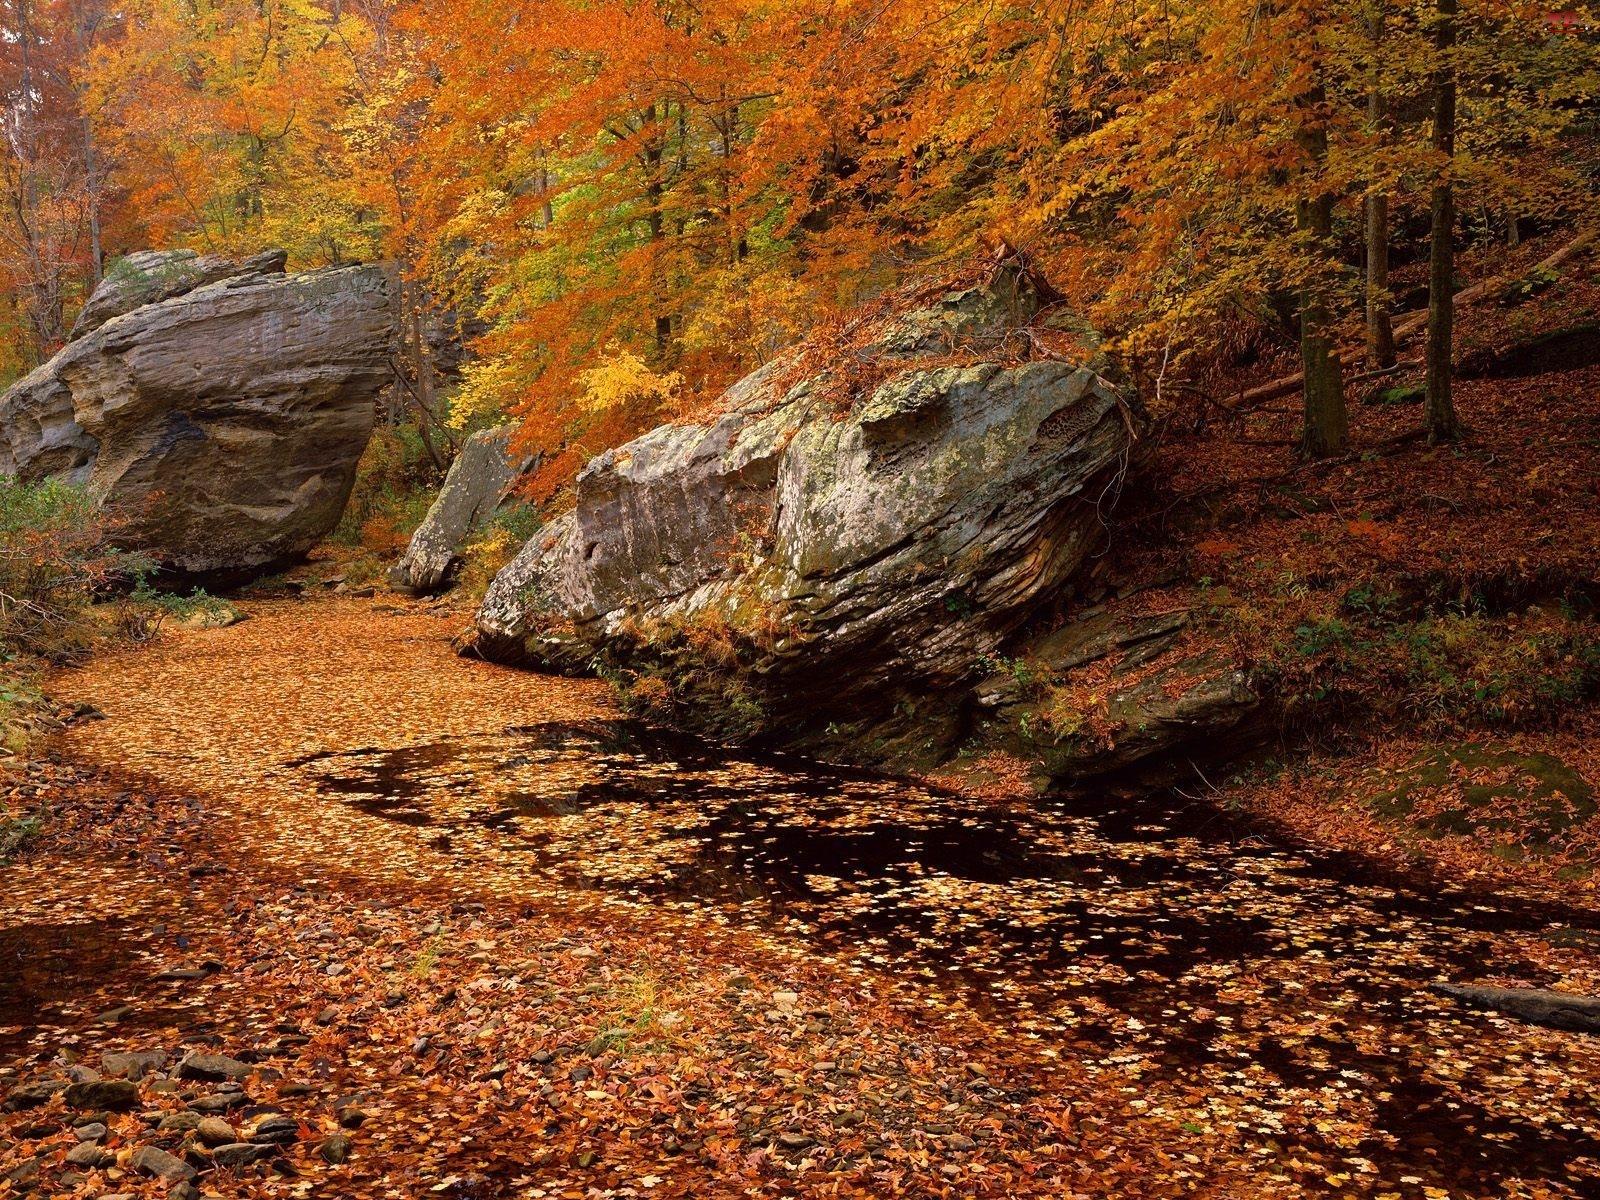 Jesieni, Las, Strumyk, Drzewa, Kolory